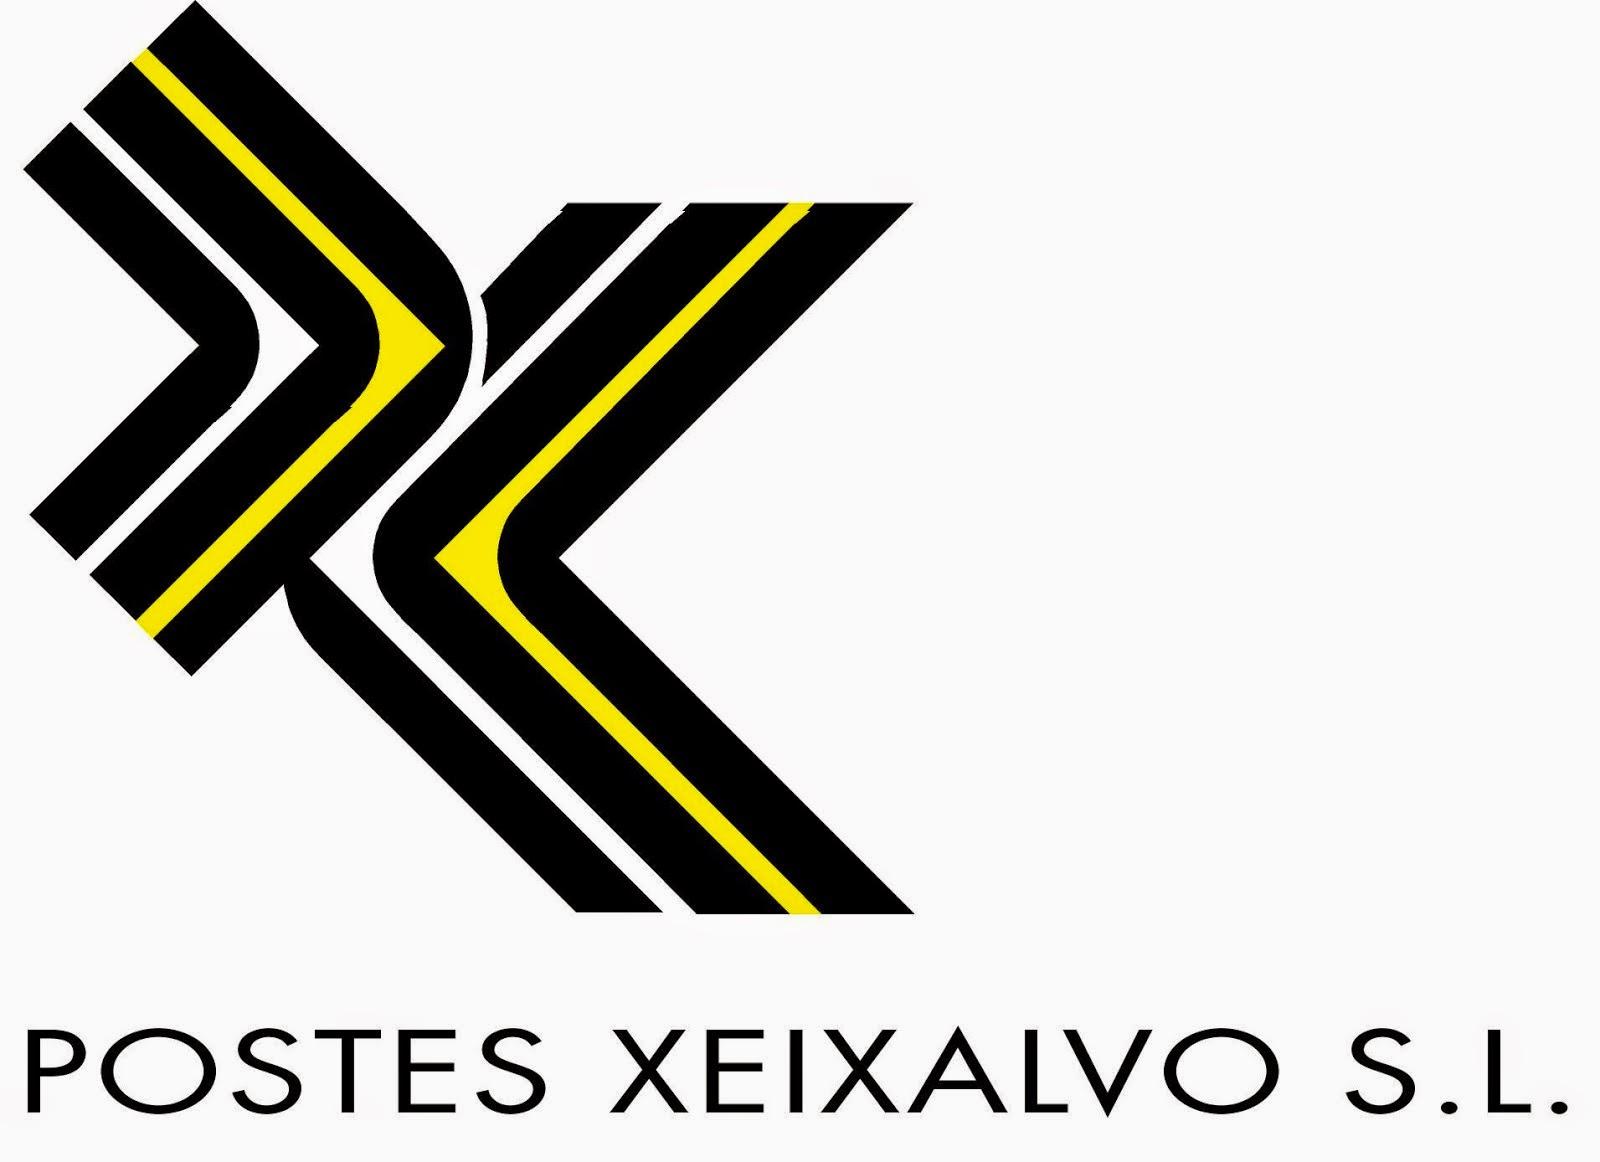 POSTES XEIXALVO